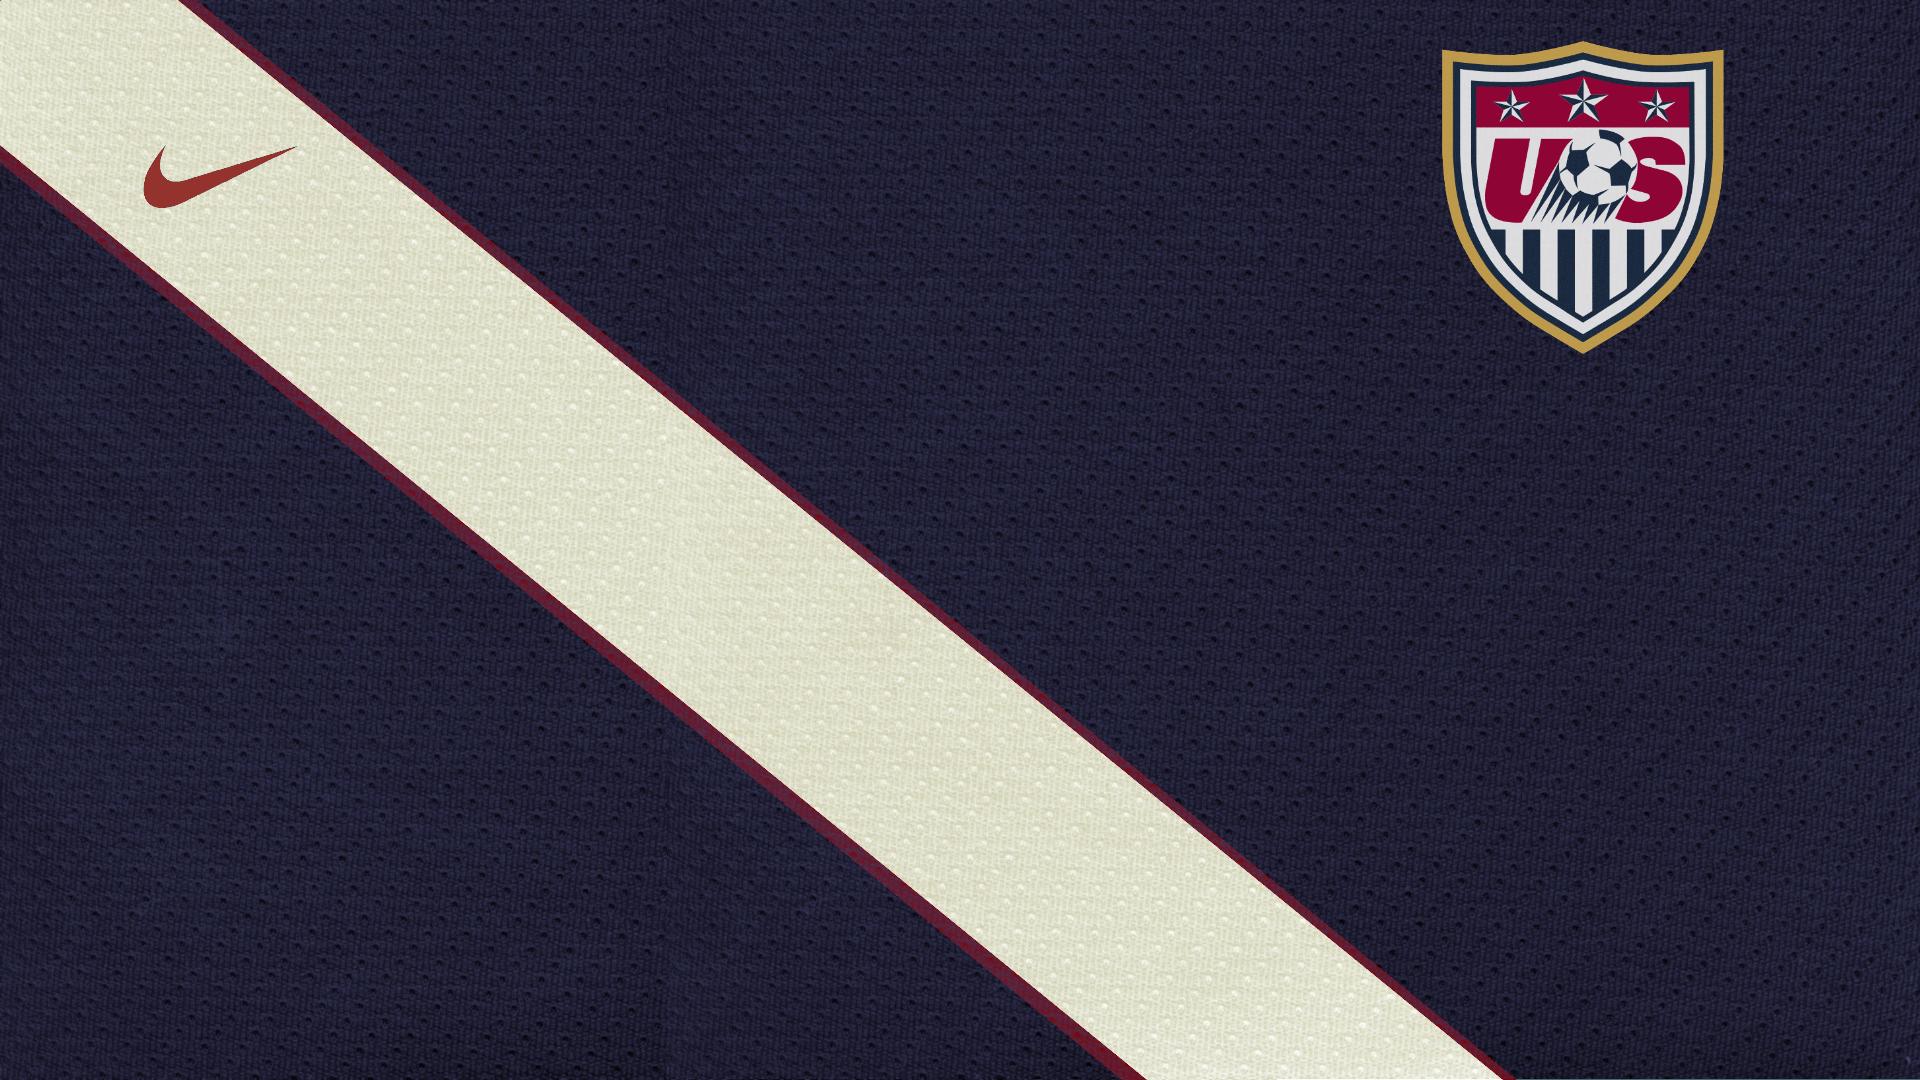 United Sates National Football Team Zoom Background 4